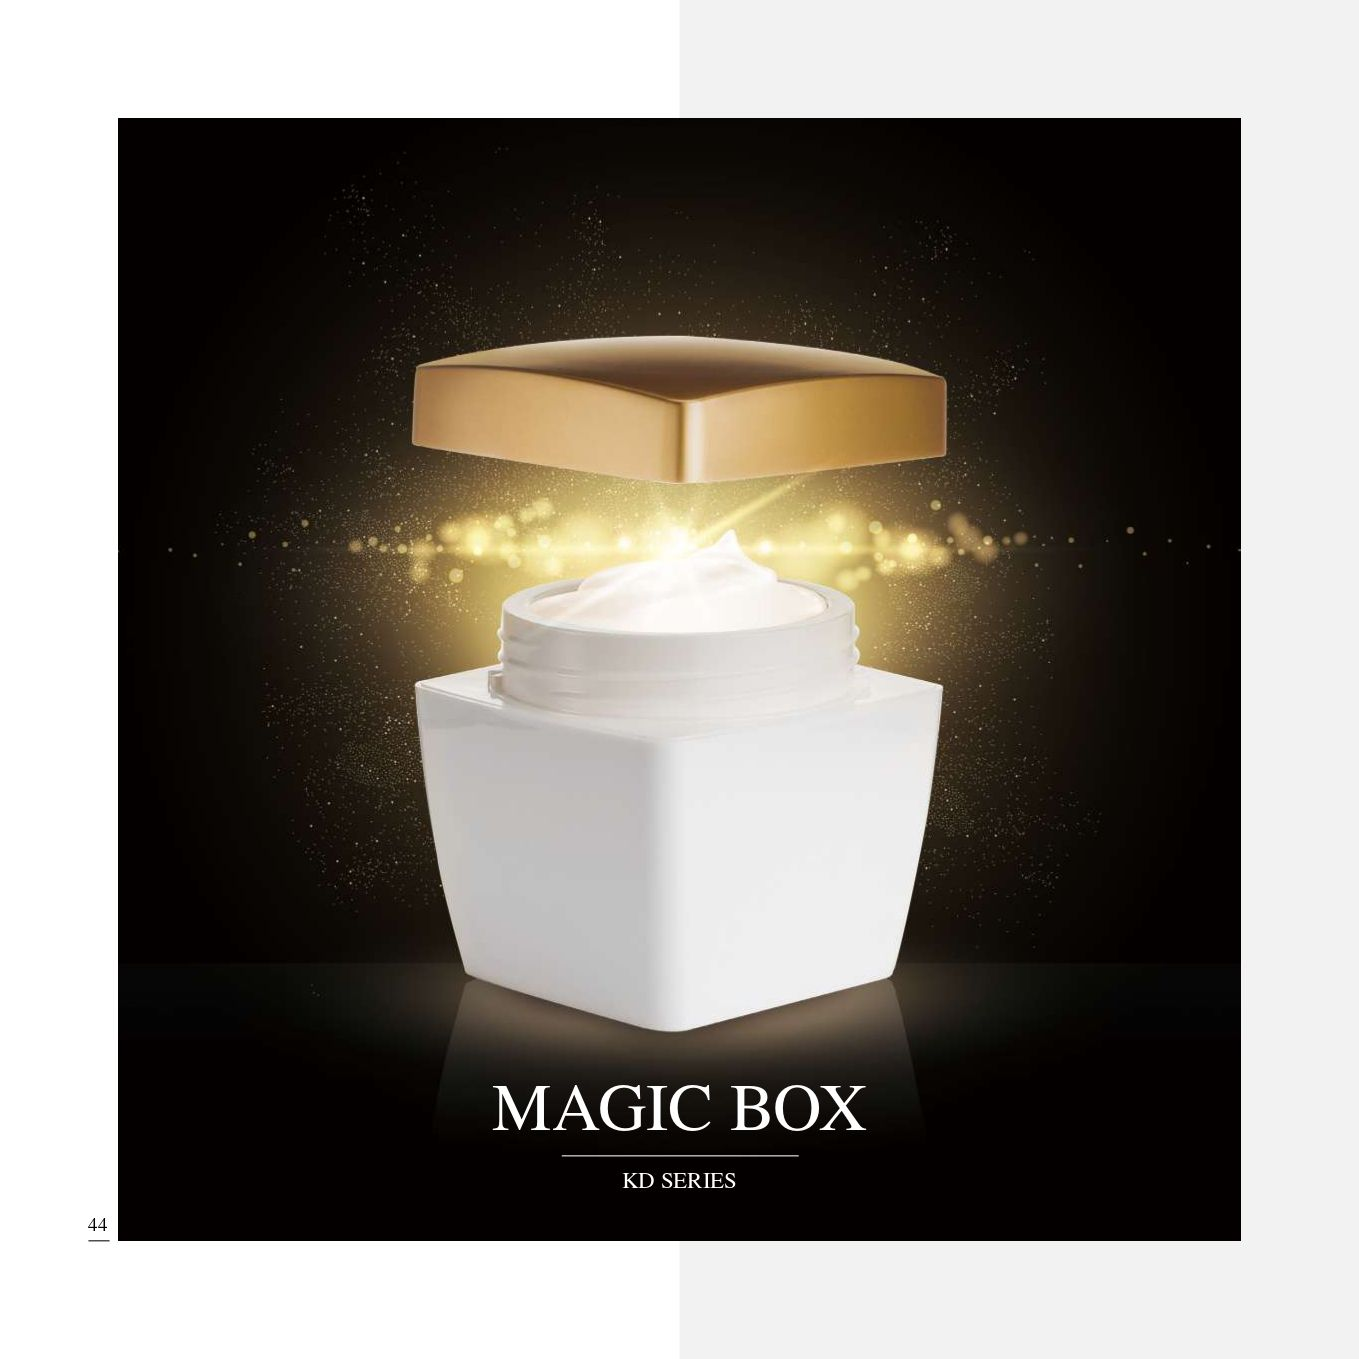 Square Shape Acrylic Luxury Cosmetic & Skincare Packaging - Luxury Acrylic Cosmetic Packaging Collection - Magic Box